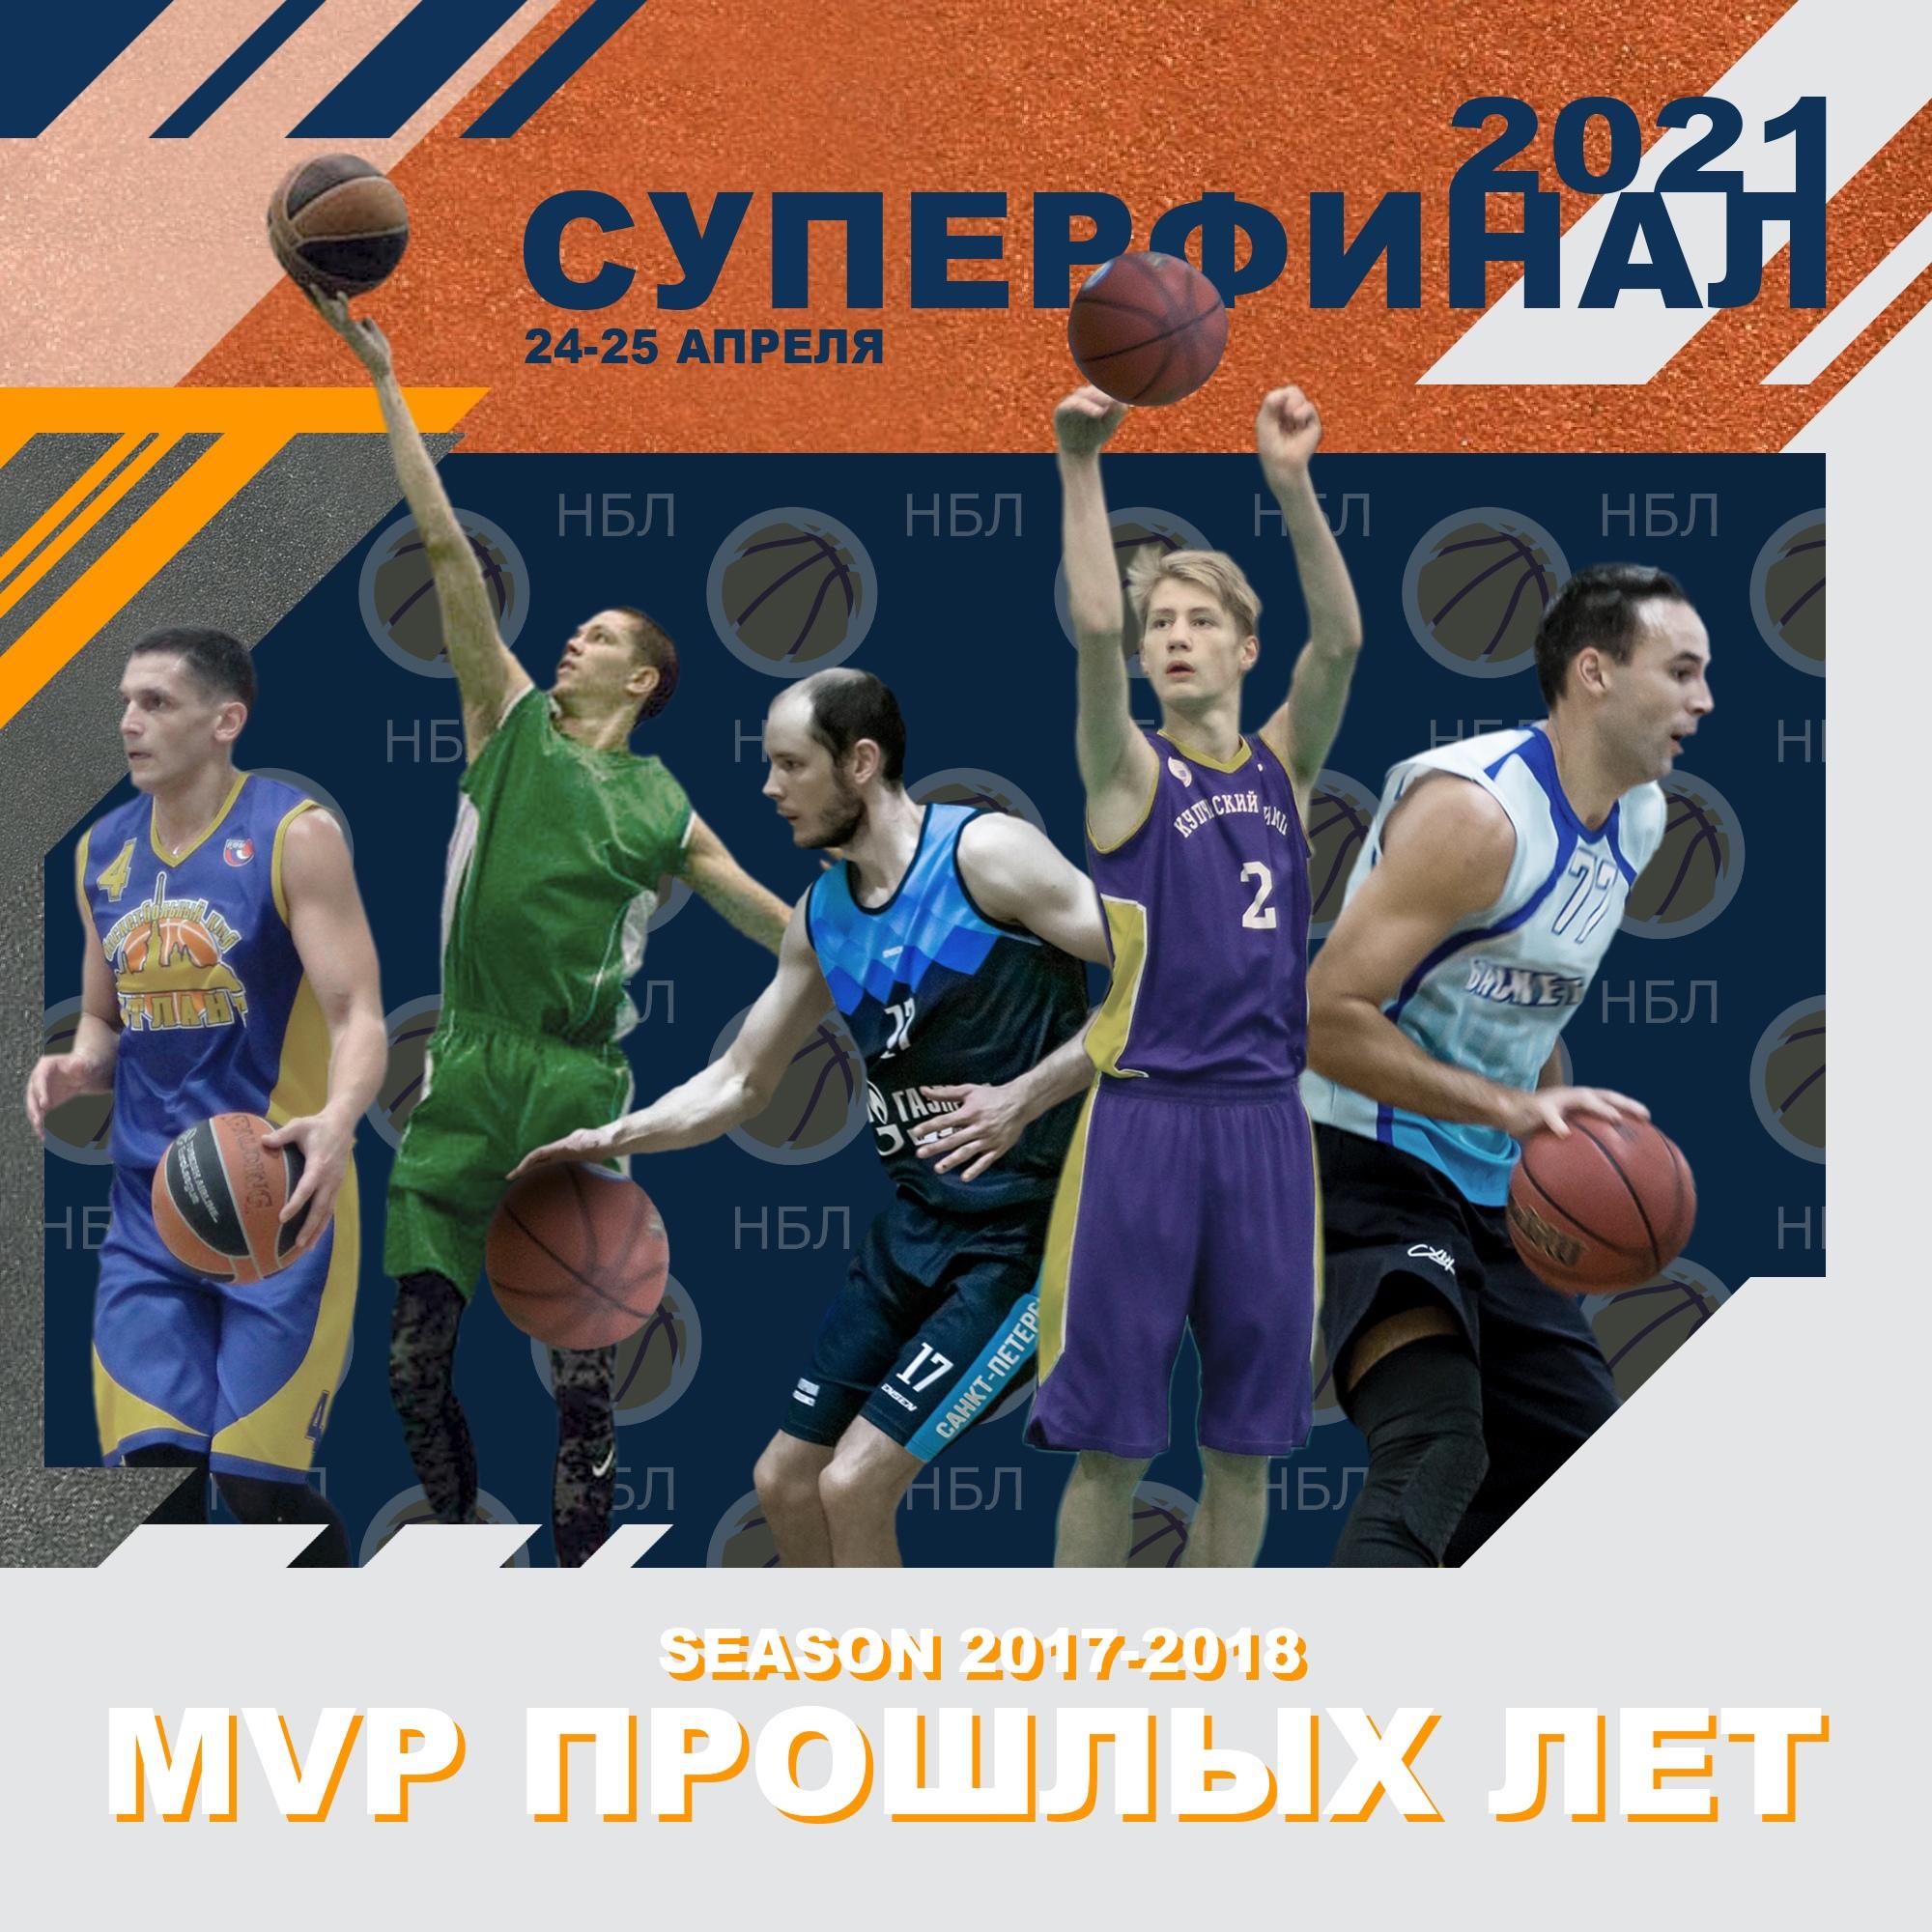 MVP сезона 2017-2018